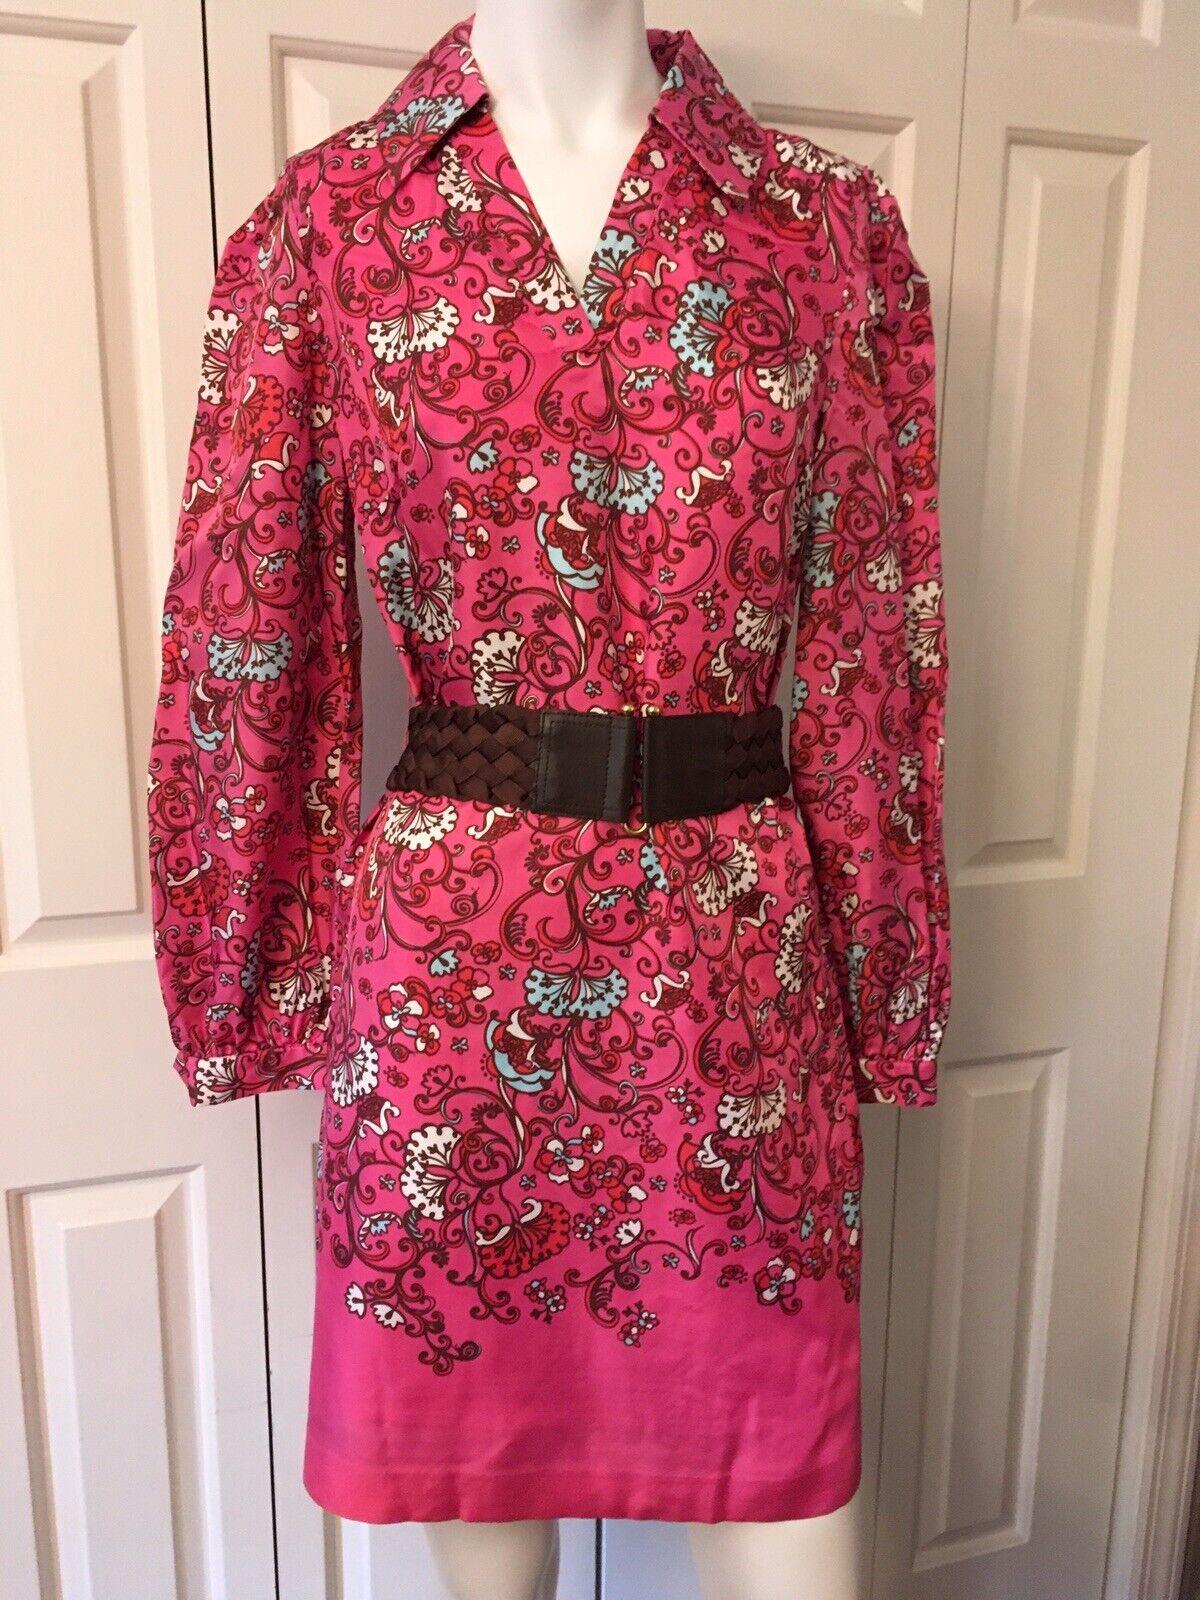 Lilly Pulitzer Pink Floral 100% Silk Shirt Dress Size 2 VGUC